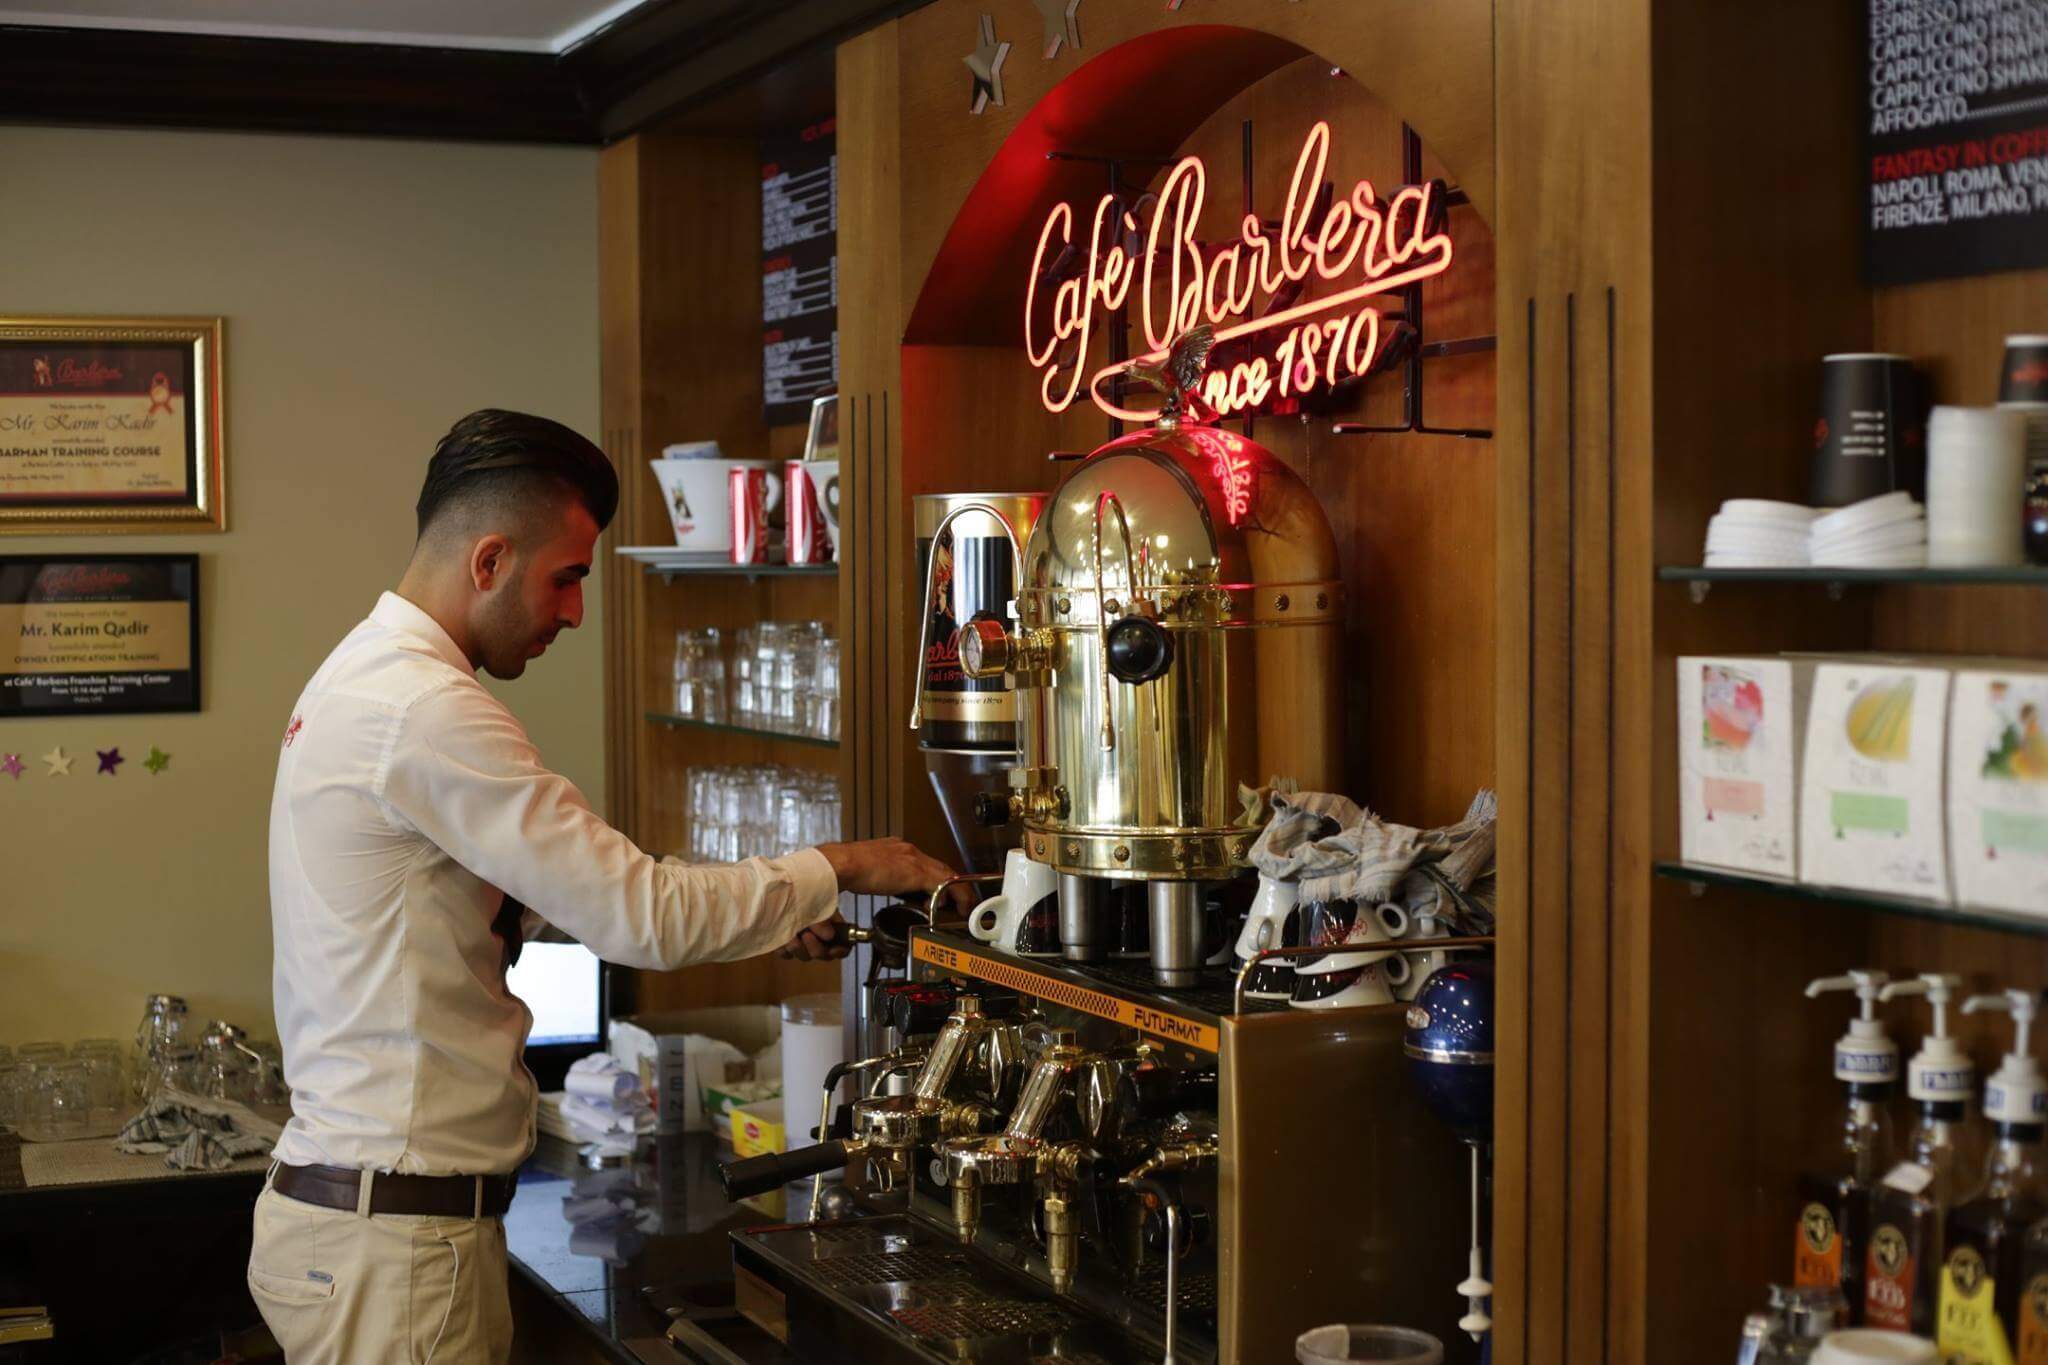 Barbera Kaffee